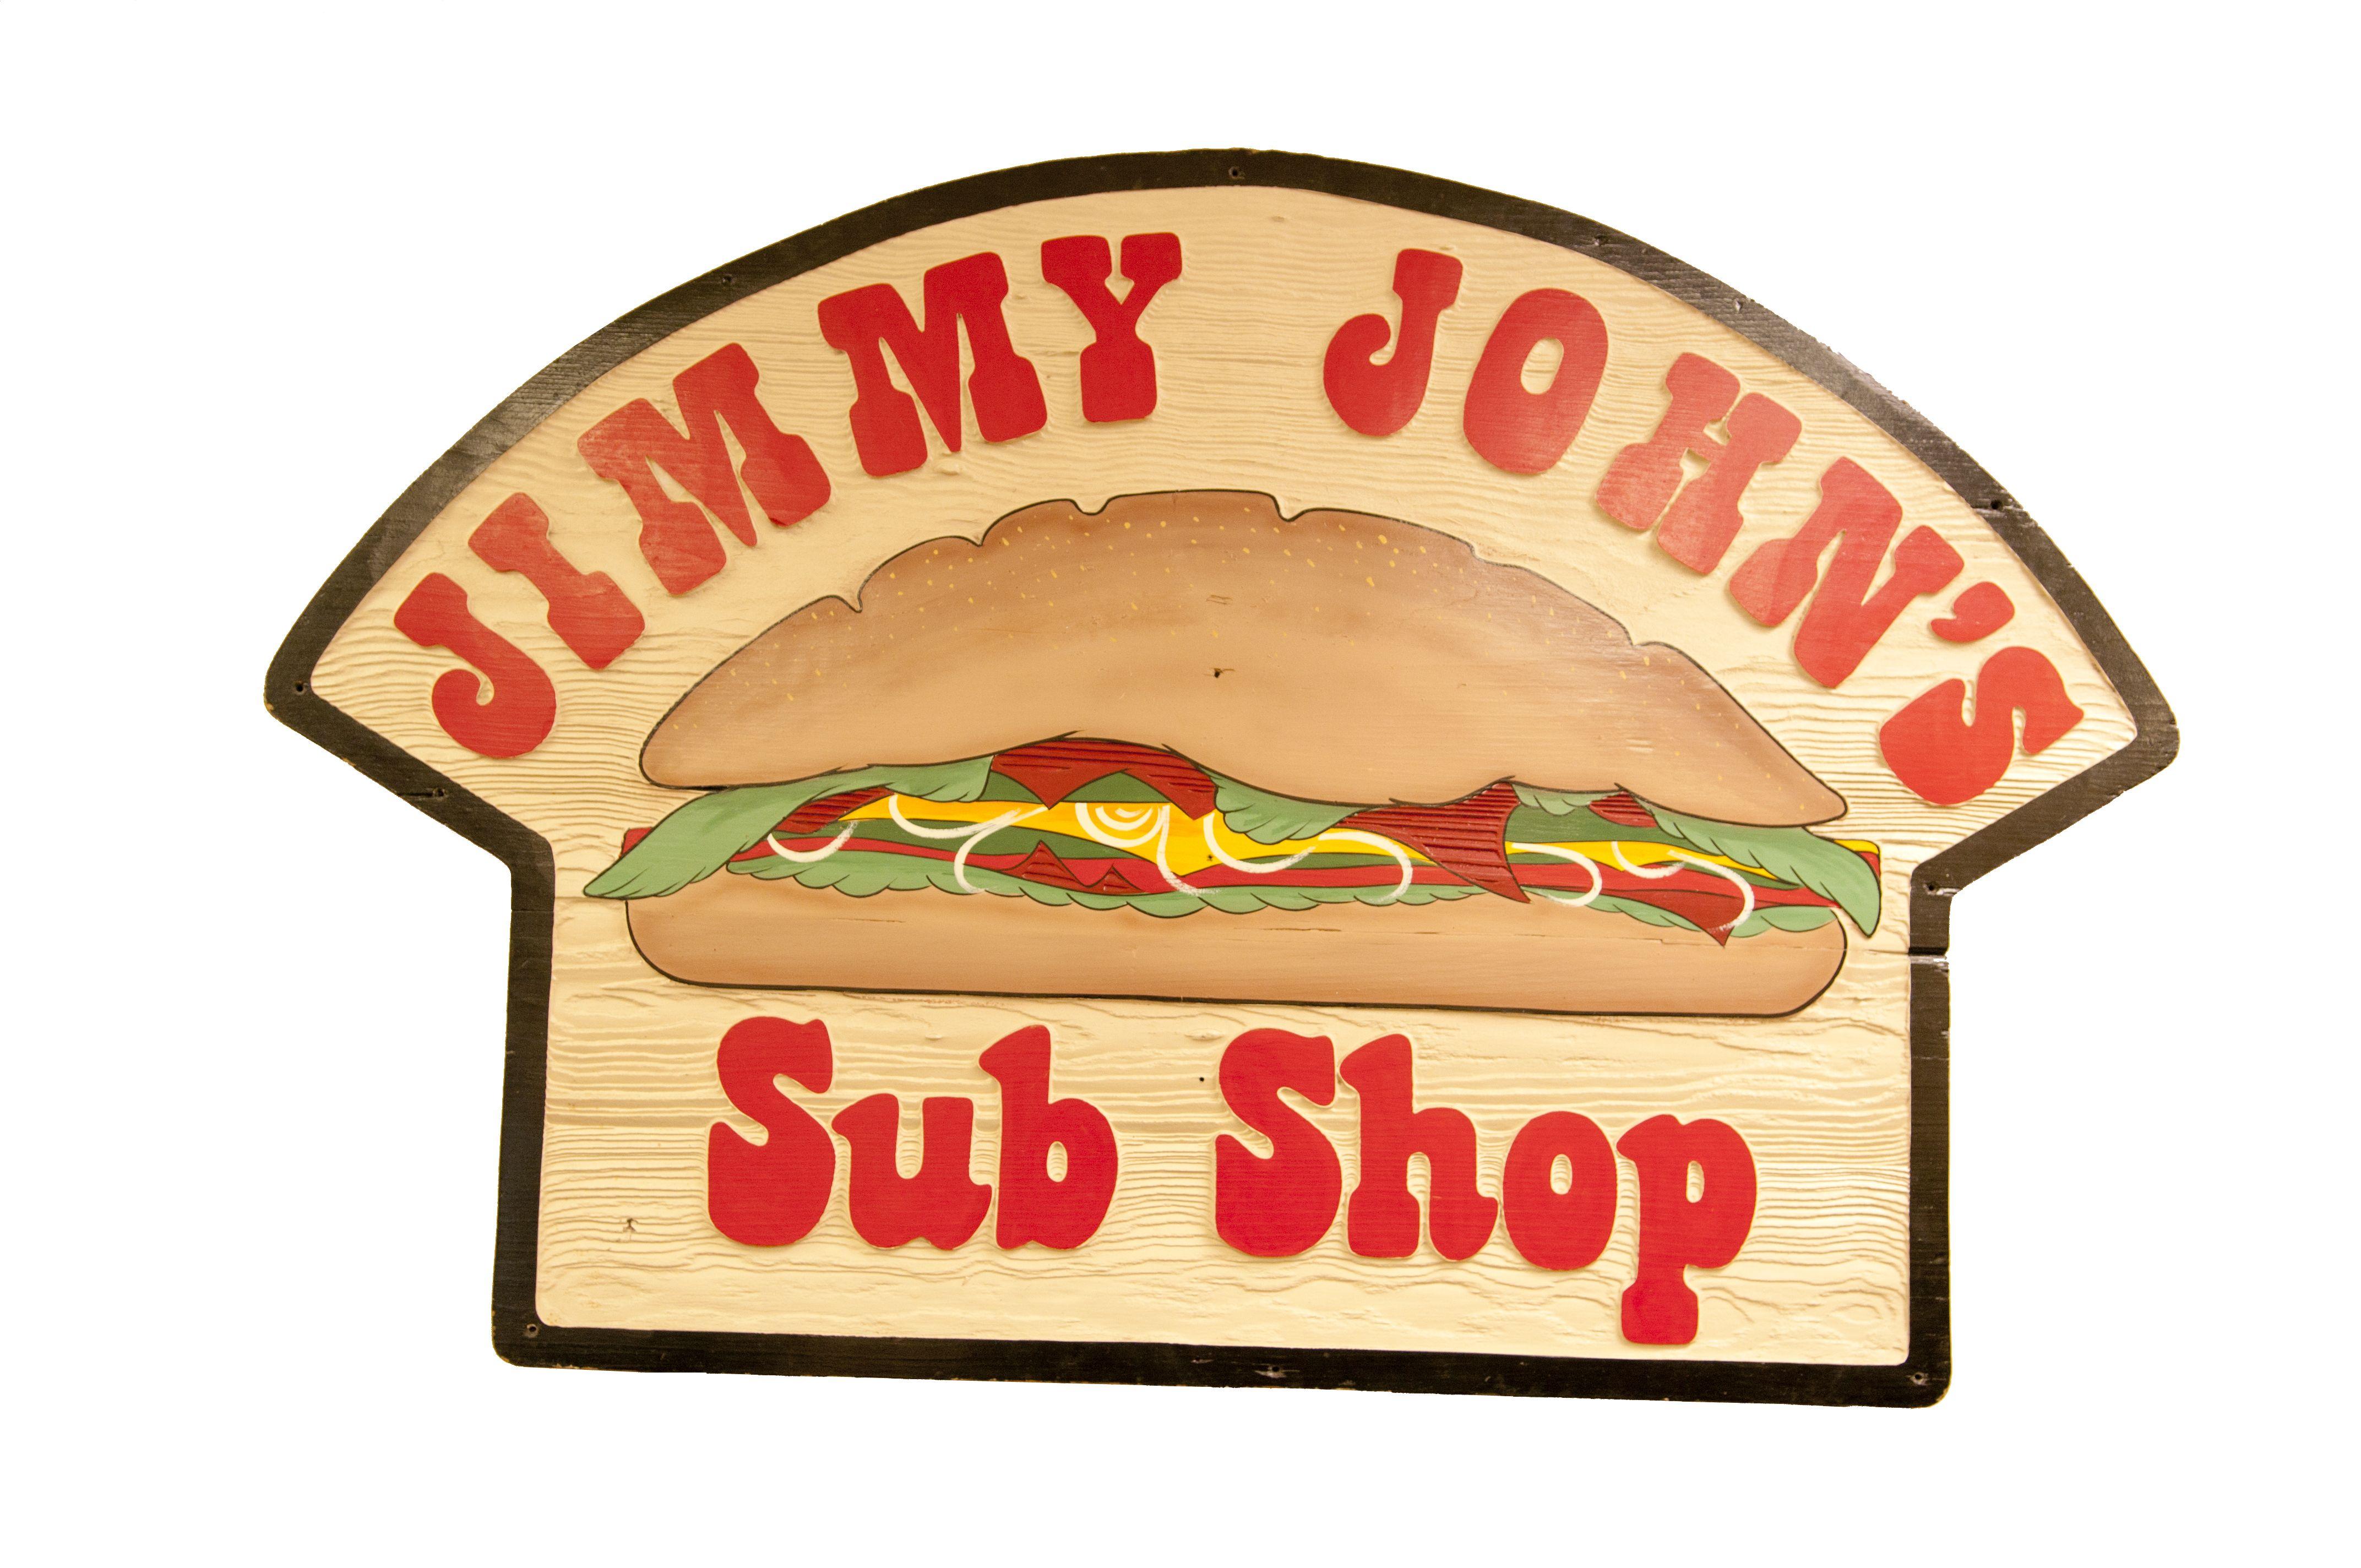 Jjs original store sign store signs jimmy johns food spot